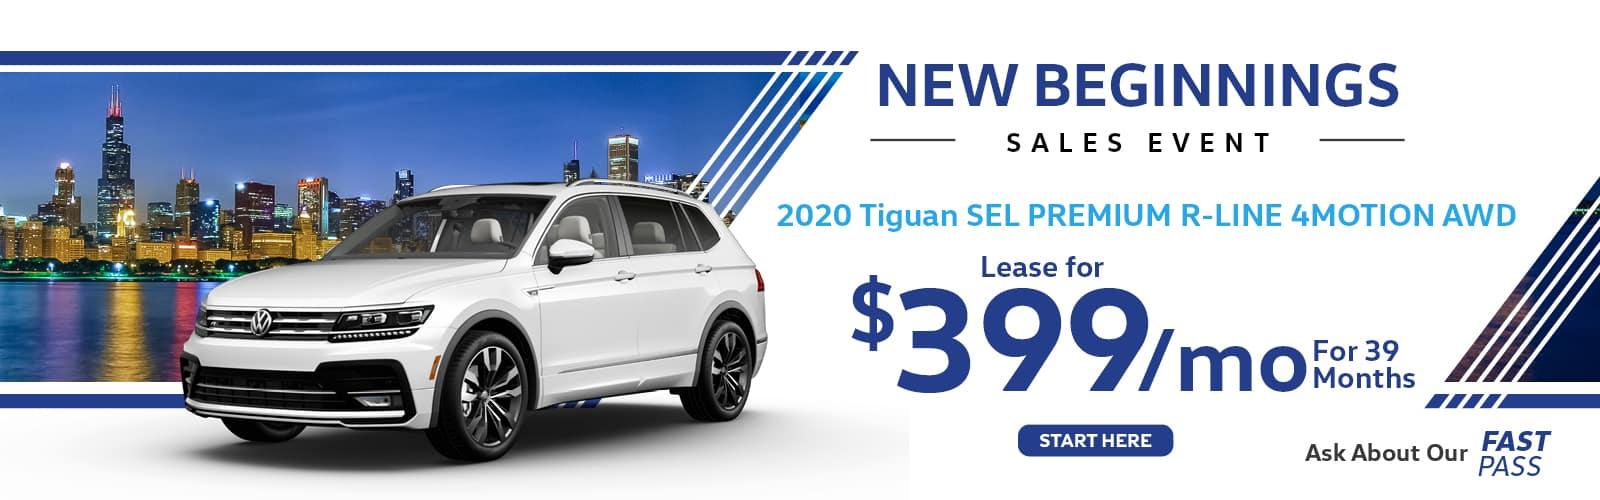 White 2020 Tiguan SEL Premium